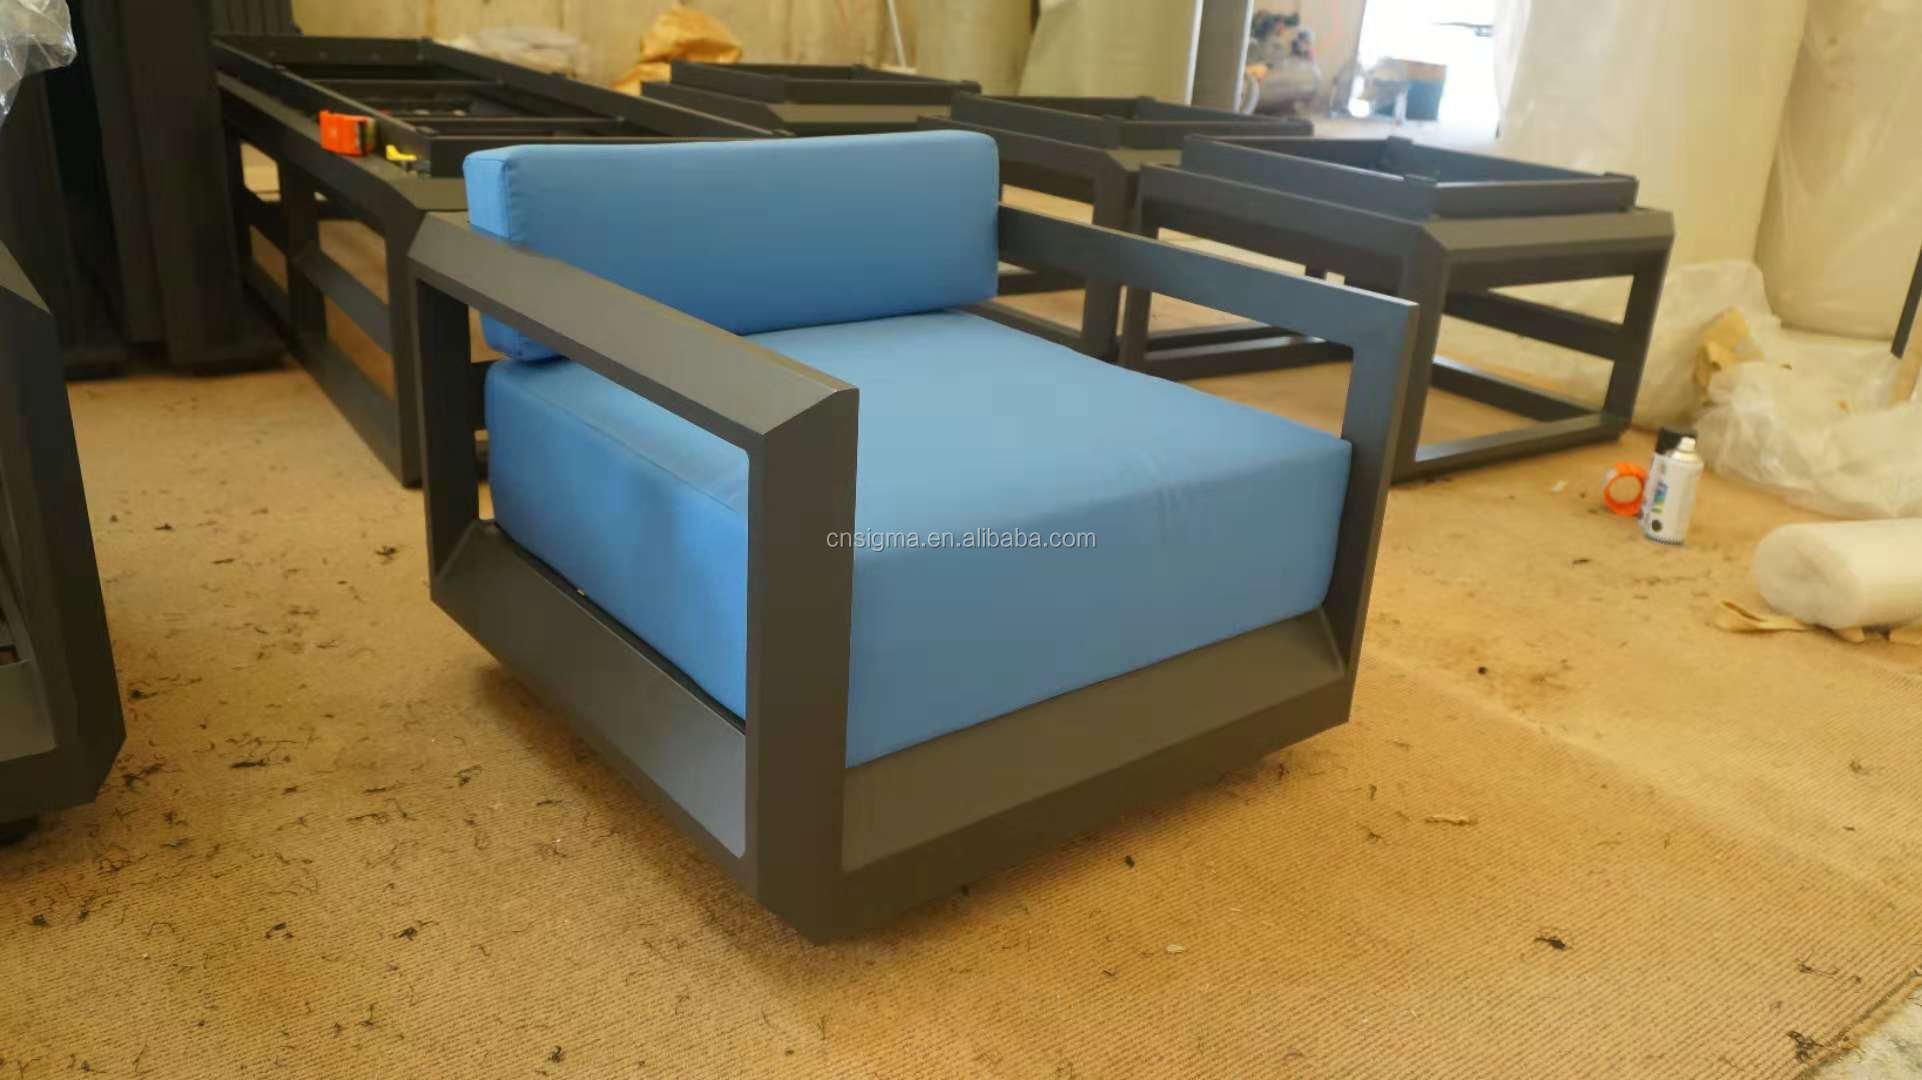 Luxury outdoor furniture maintenance free outdoor furniture aluminium hand crafted sofa